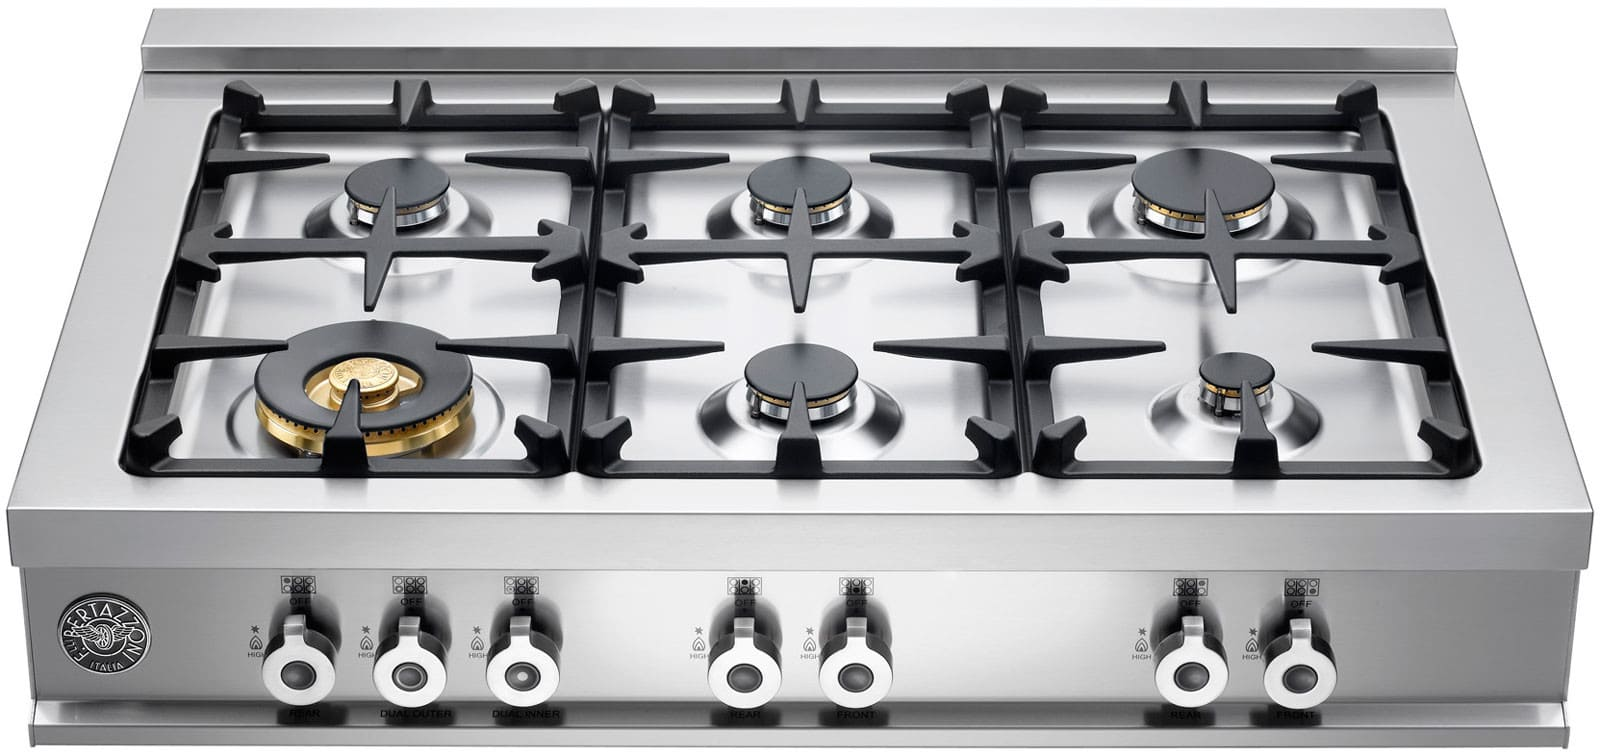 Bertazzoni Cb36600xlp 36 Inch Pro Style Gas Rangetop With